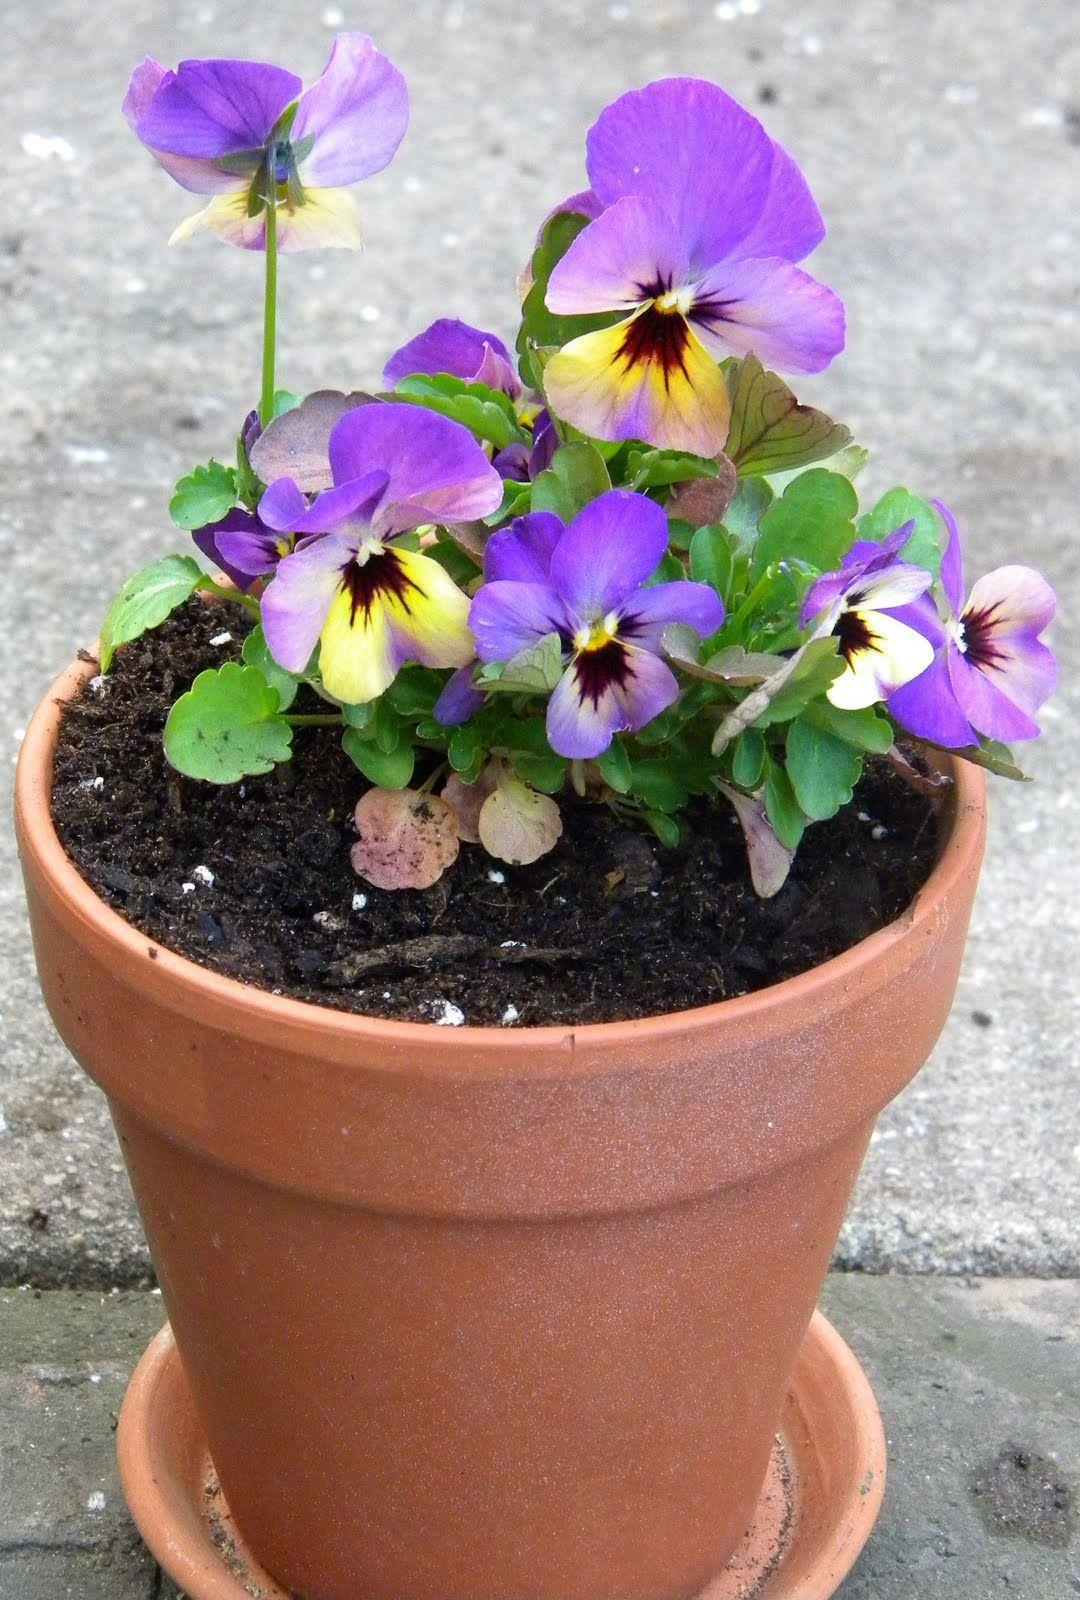 Pansy Flower Pot Wedding Centerpieces Ideas Google Search Pansies Flowers Pansies Flower Planters